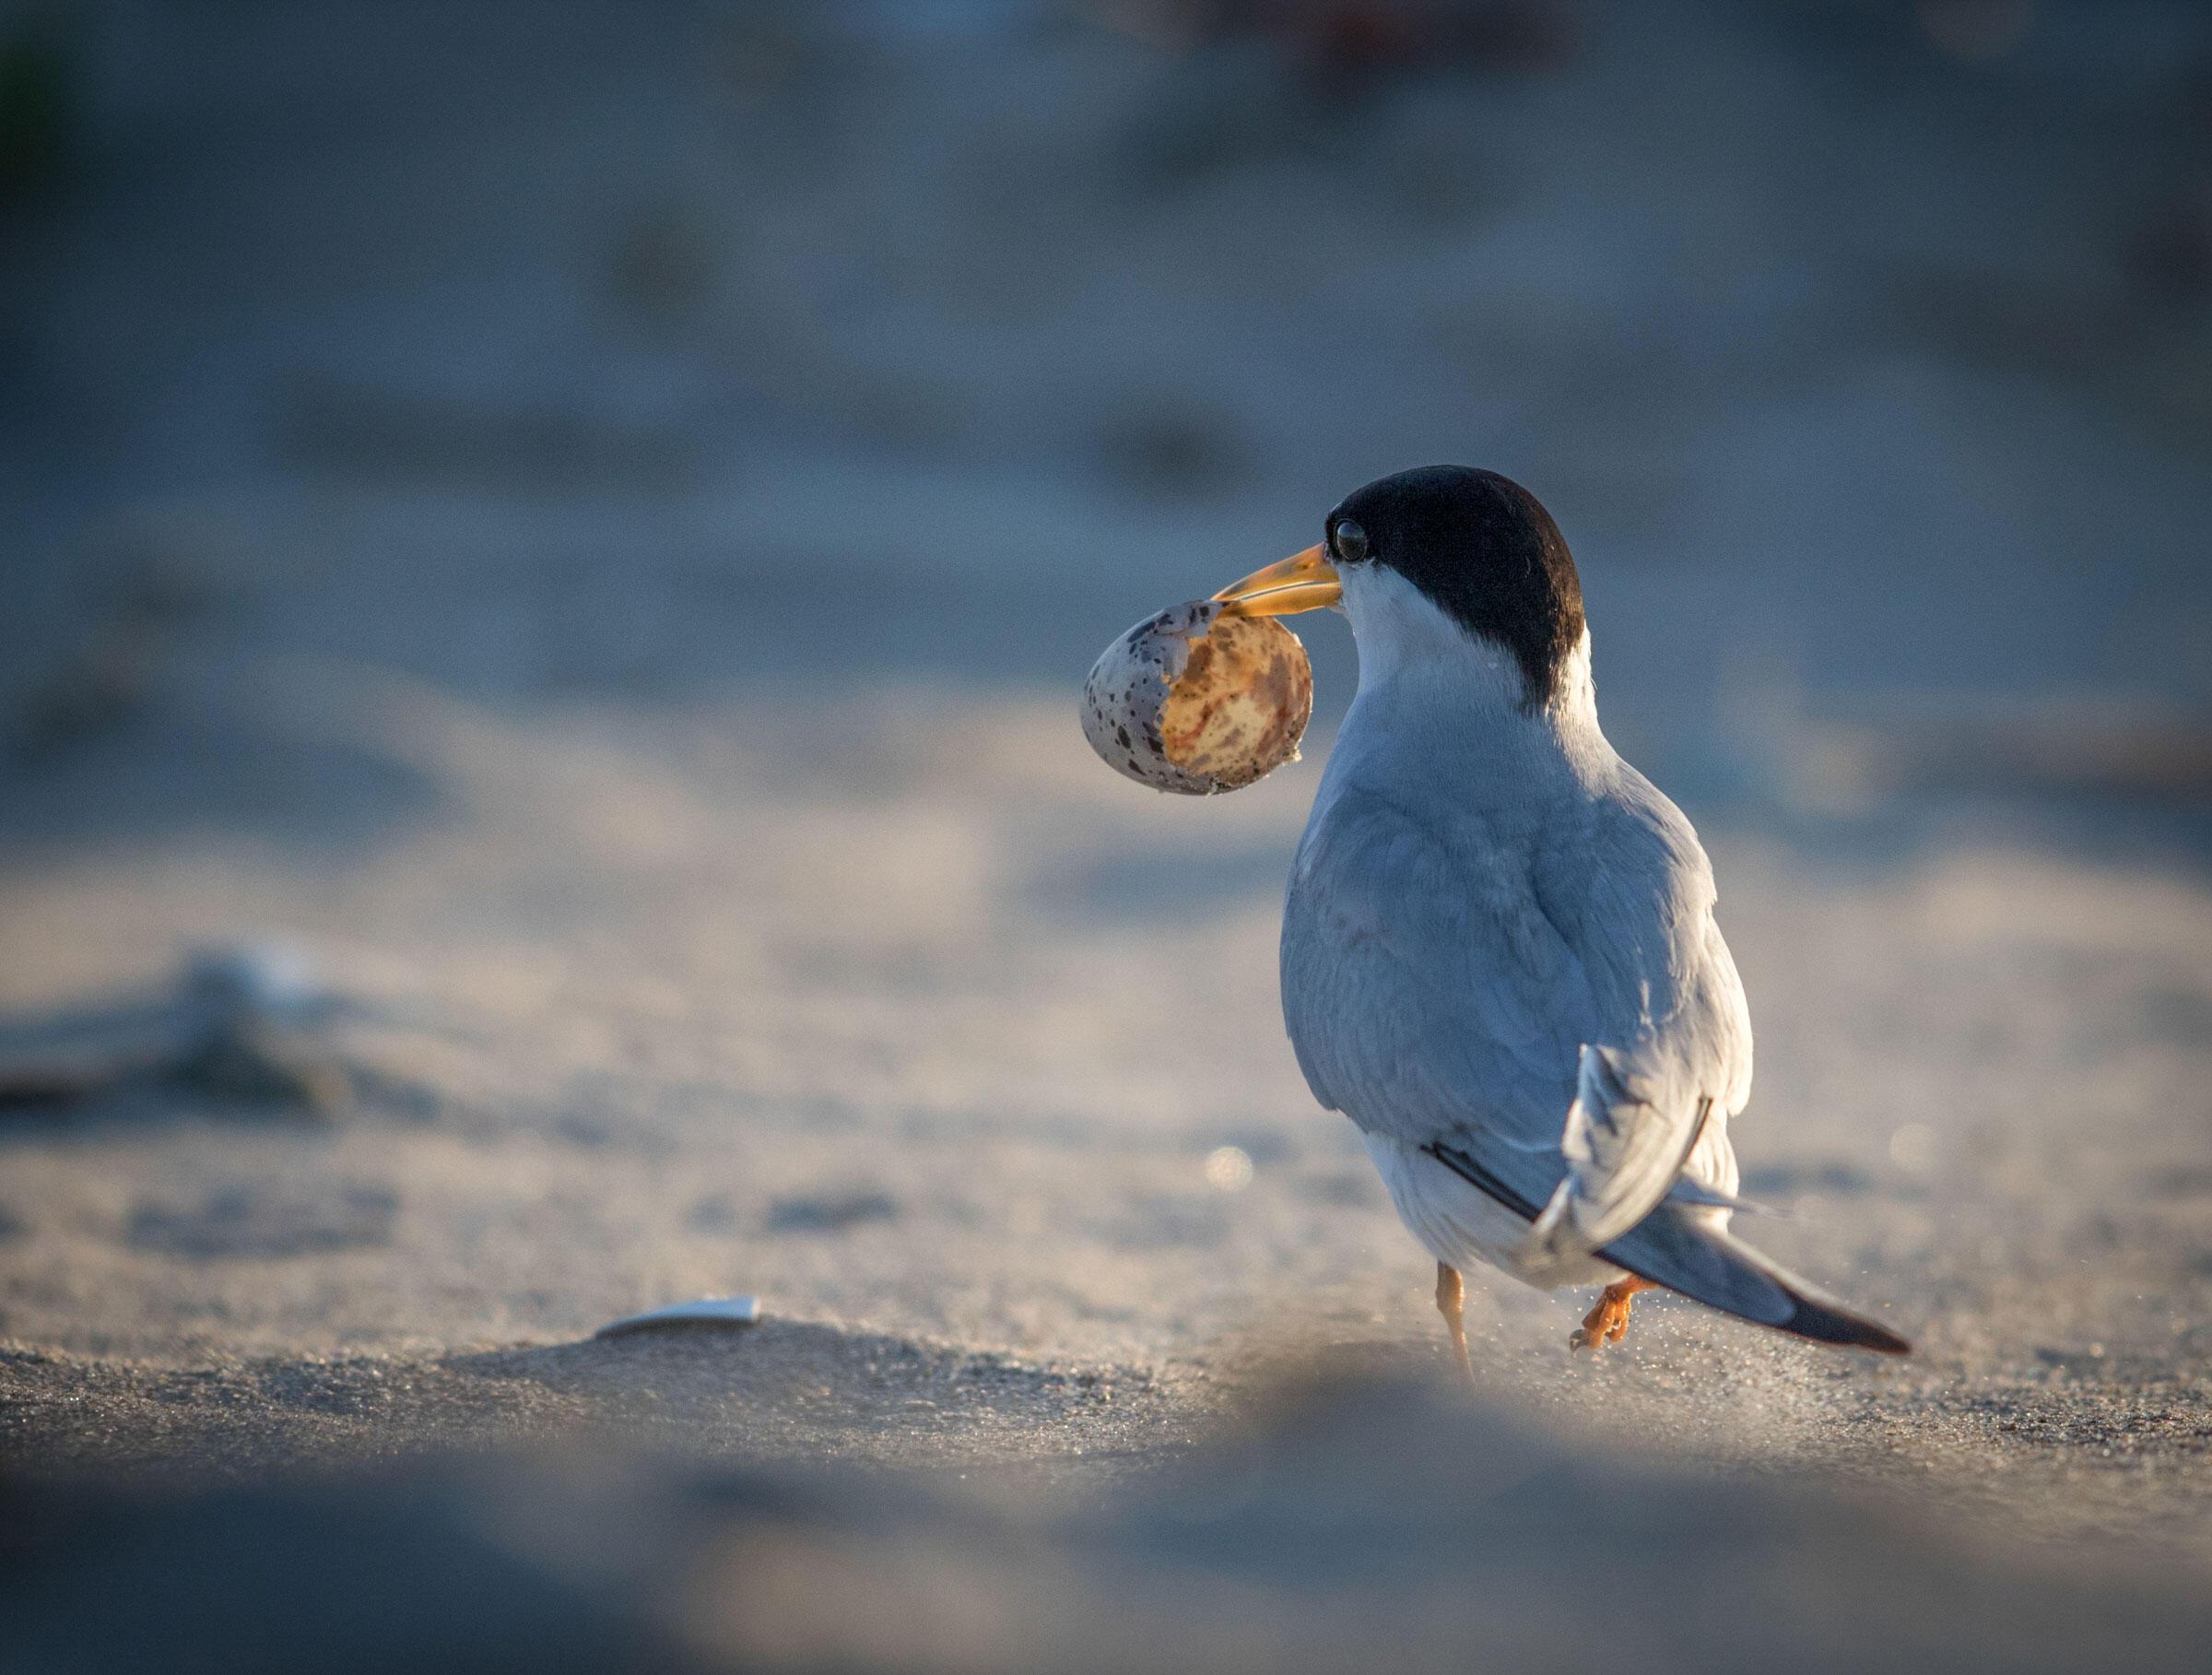 Least Tern/Amateur Category. Eric Swanzey/Audubon Photography Awards